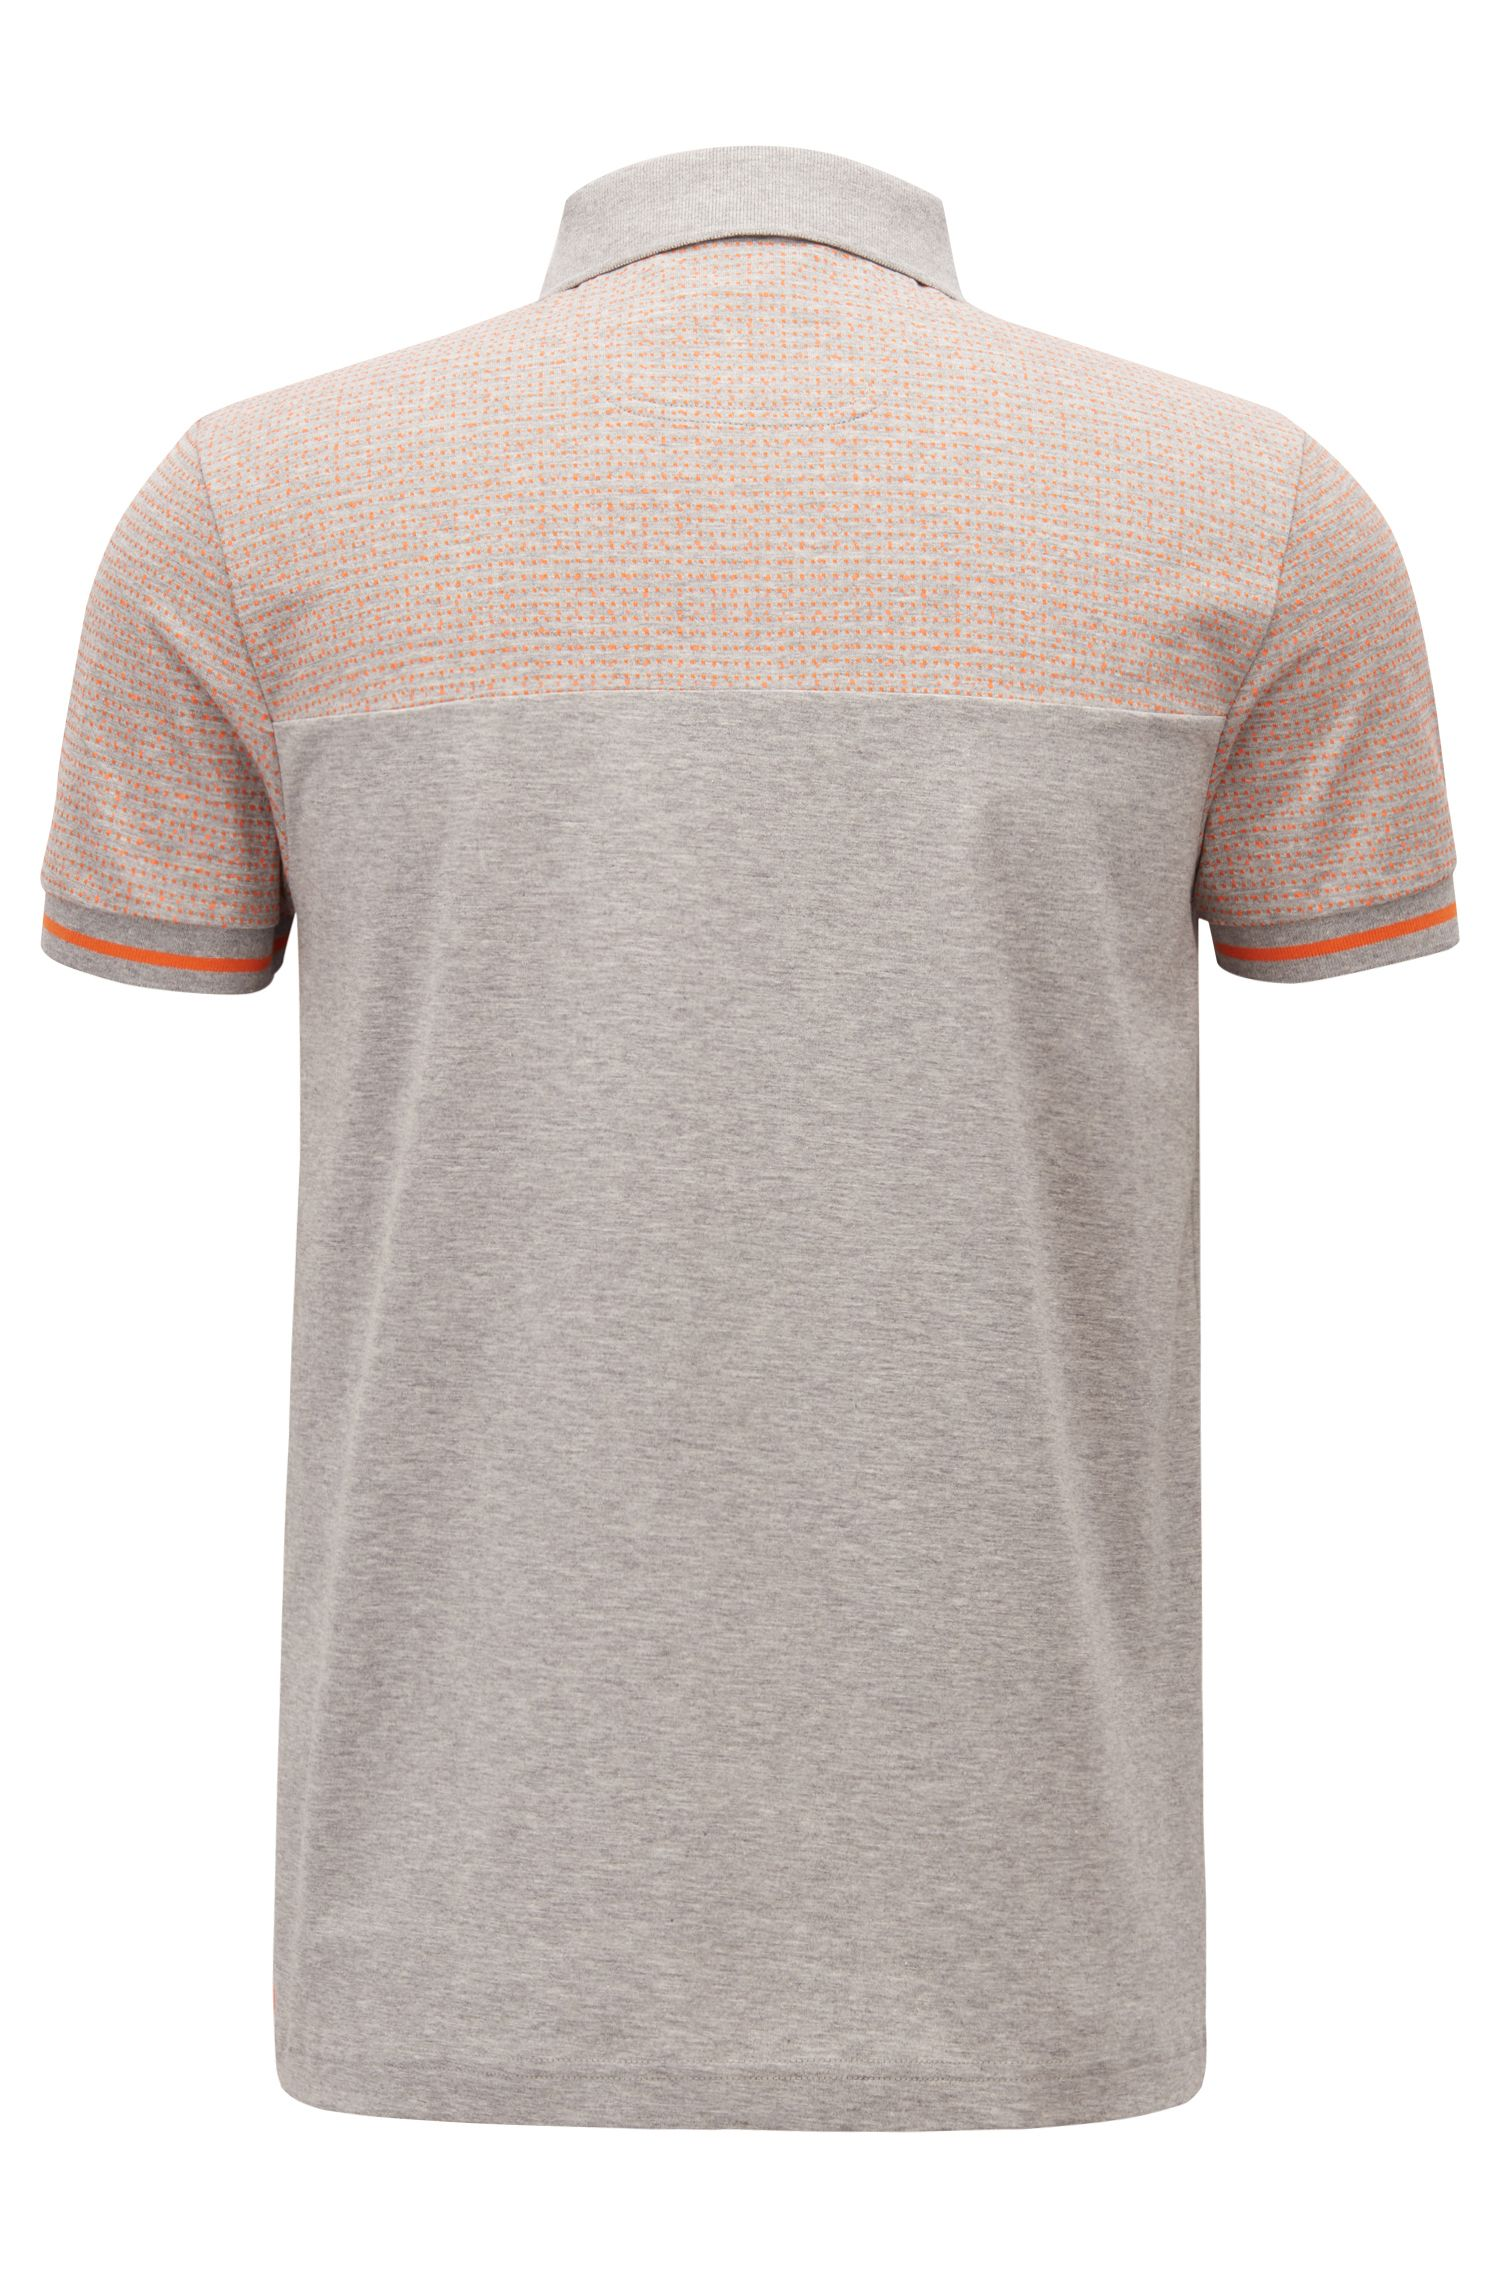 Meliertes Poloshirt aus Baumwolle im Colour-Block-Design, Hellgrau